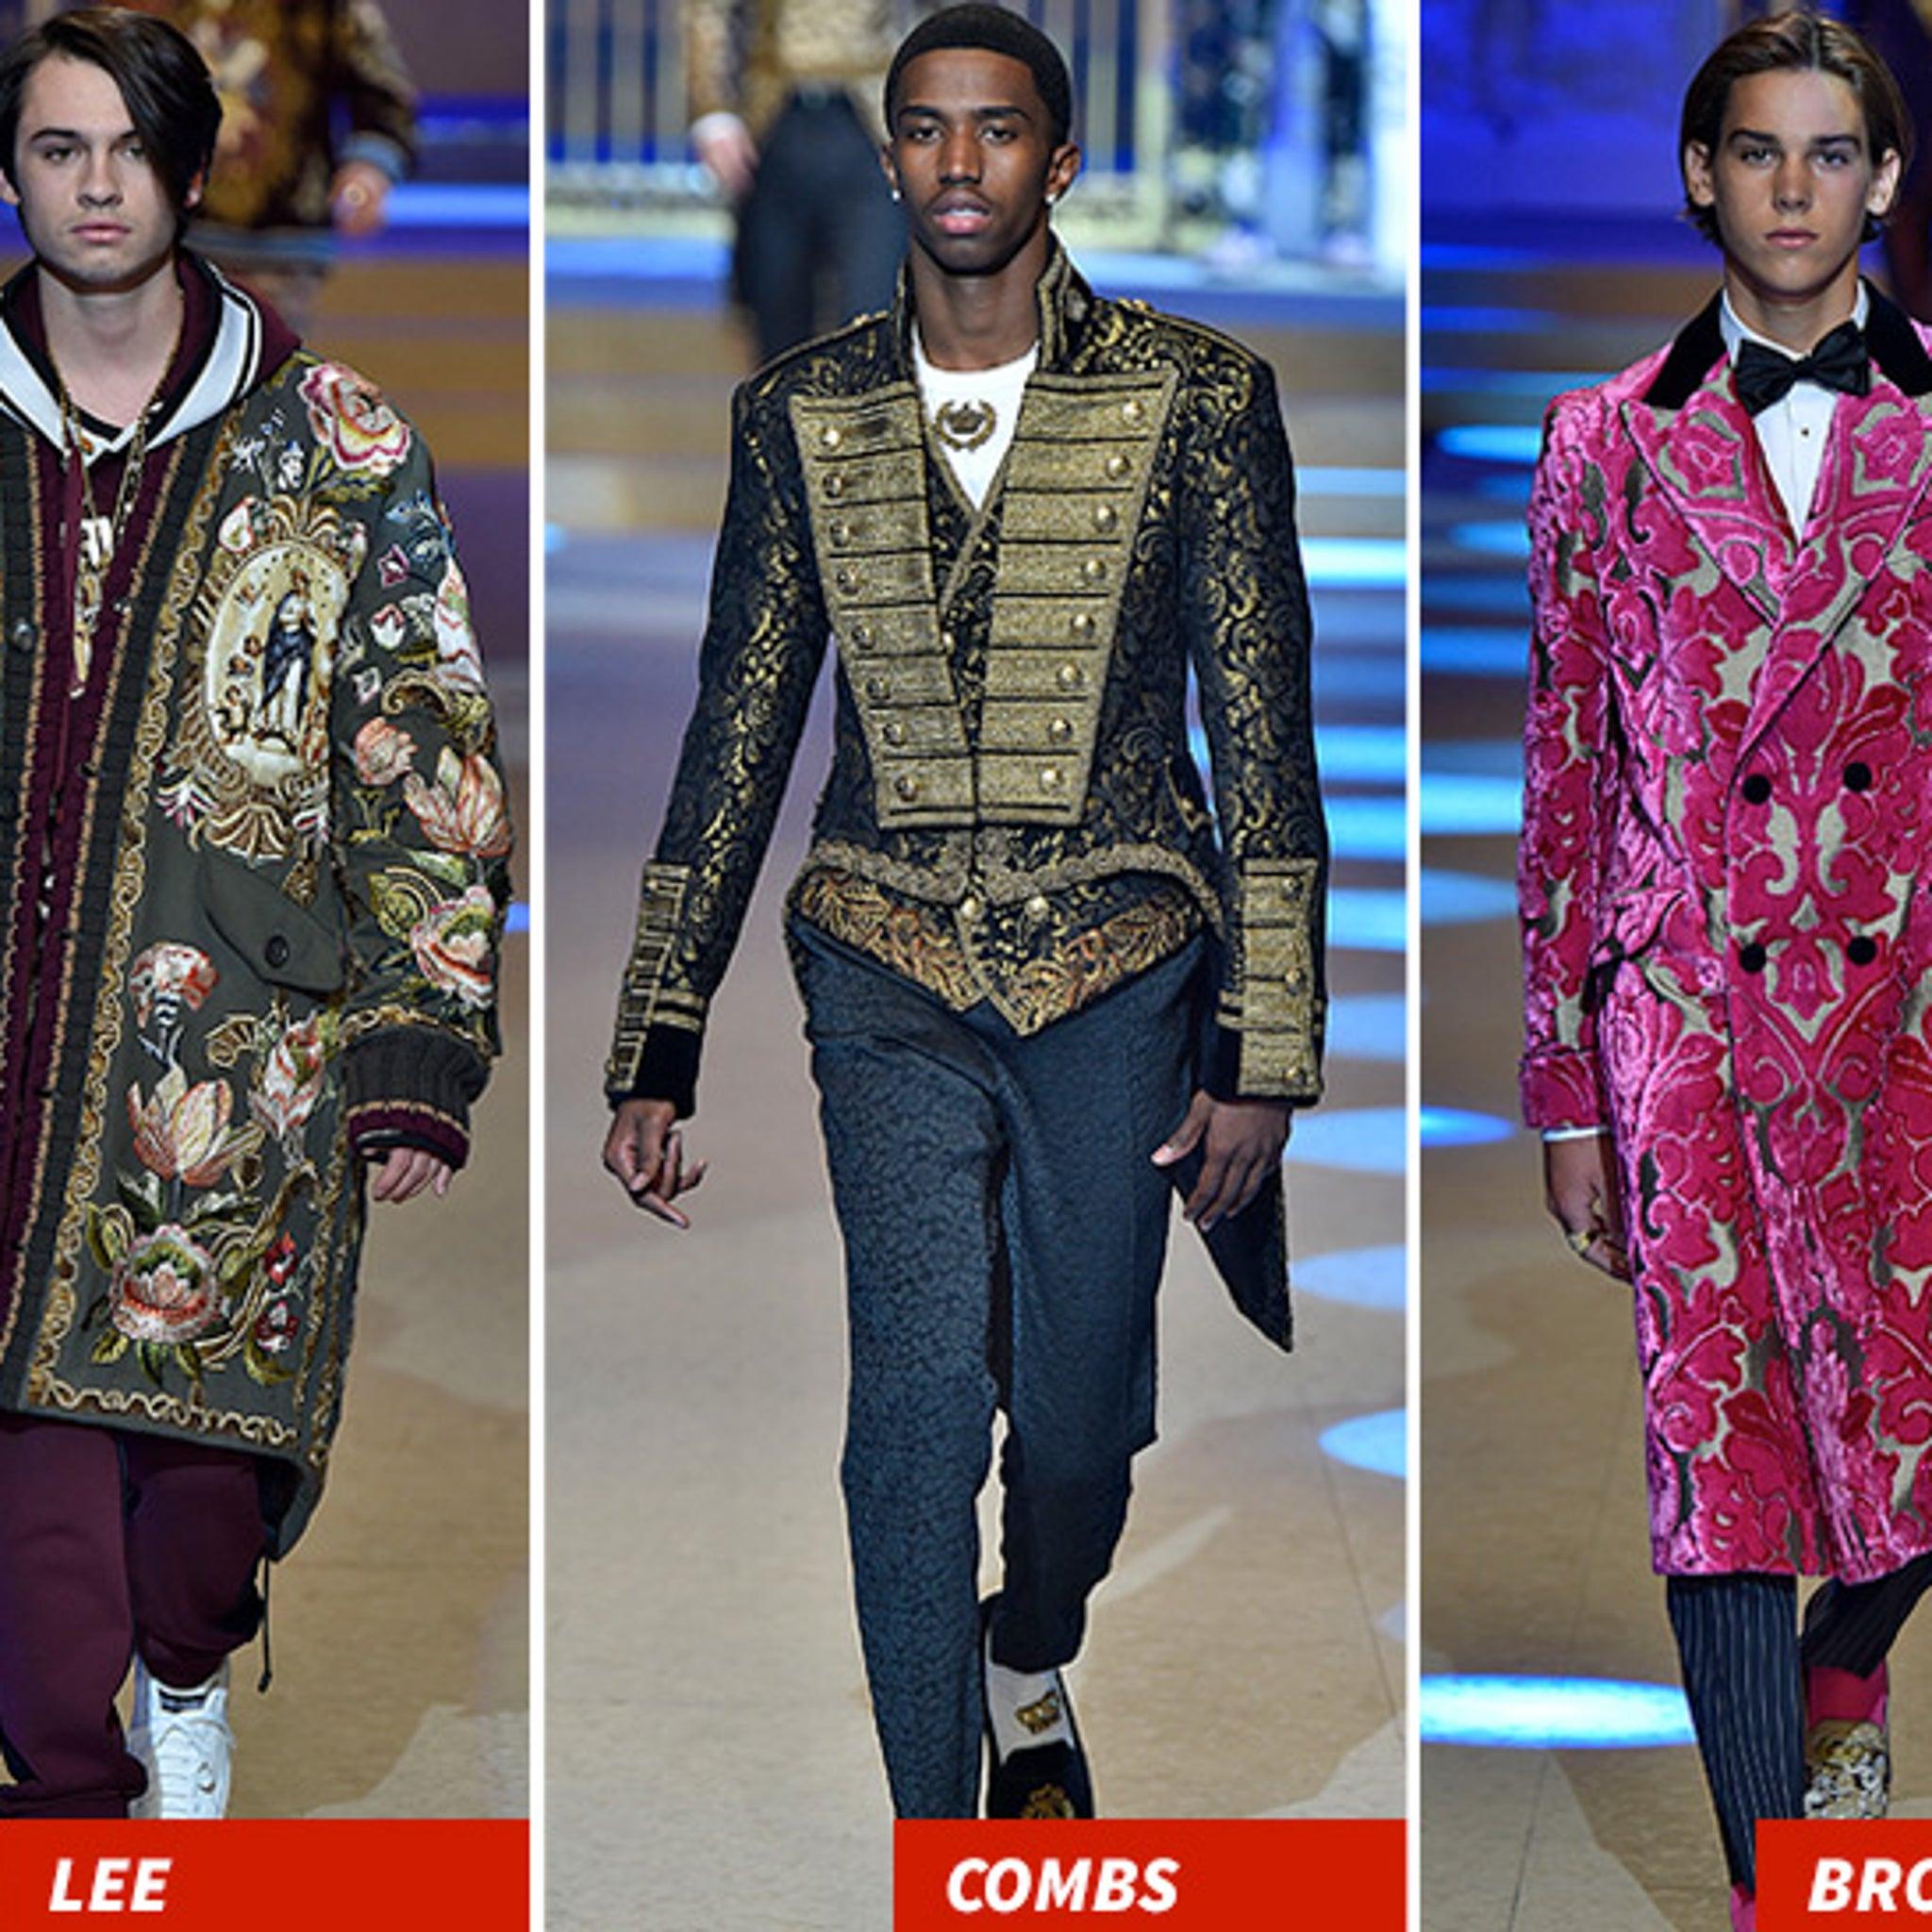 b762617d97 Milan Fashion Week's Dolce & Gabbana Show Featured a Ton of Celeb's Kids